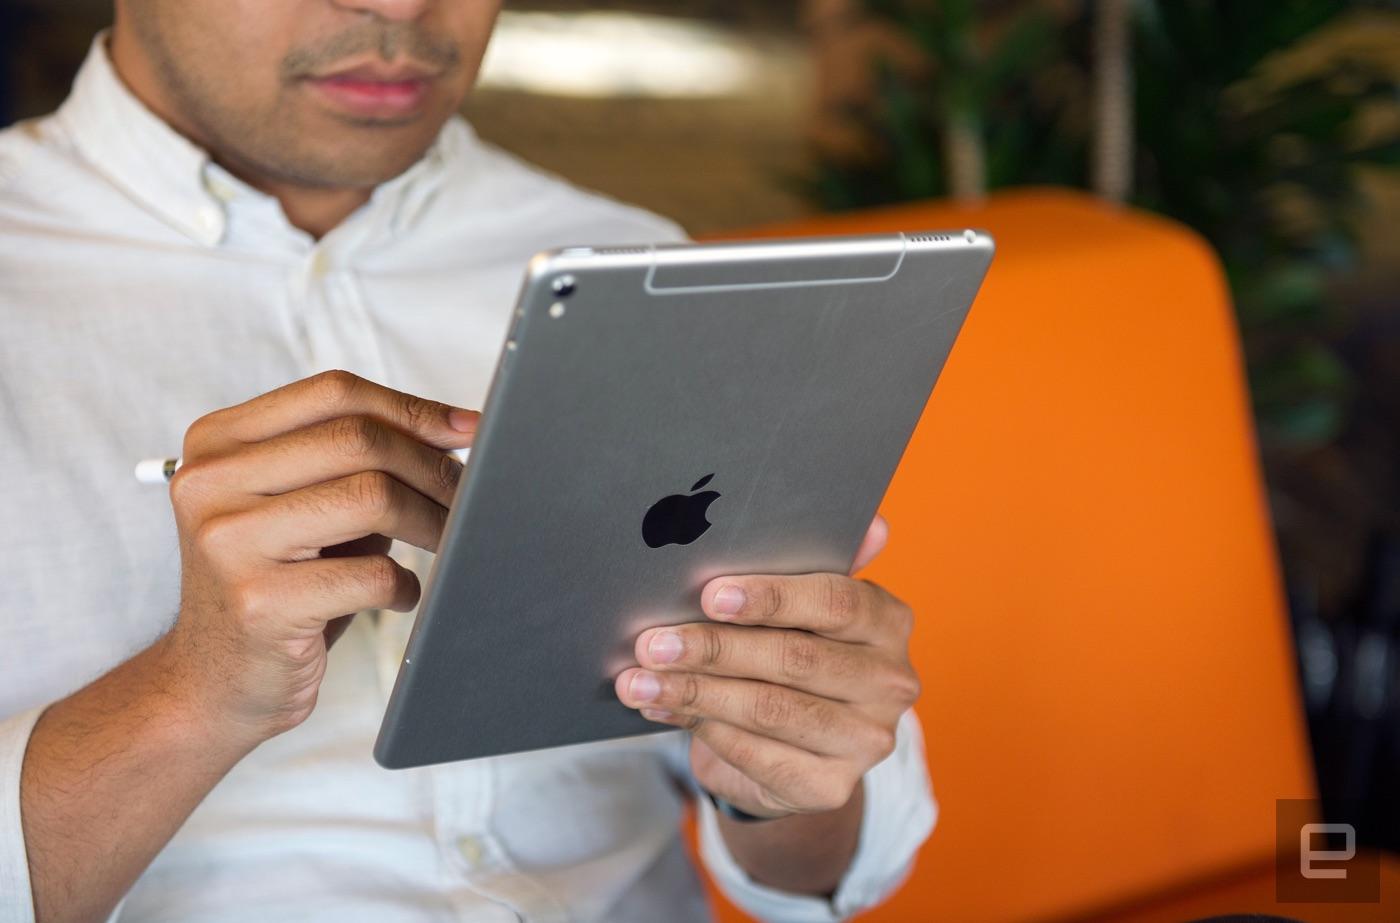 iPad Pro 9.7 review: Apple's best tablet, but it won't replace a laptopsavesharesavesharesavesharesavesharesavesharesaveshareear iconeye icontext filevr